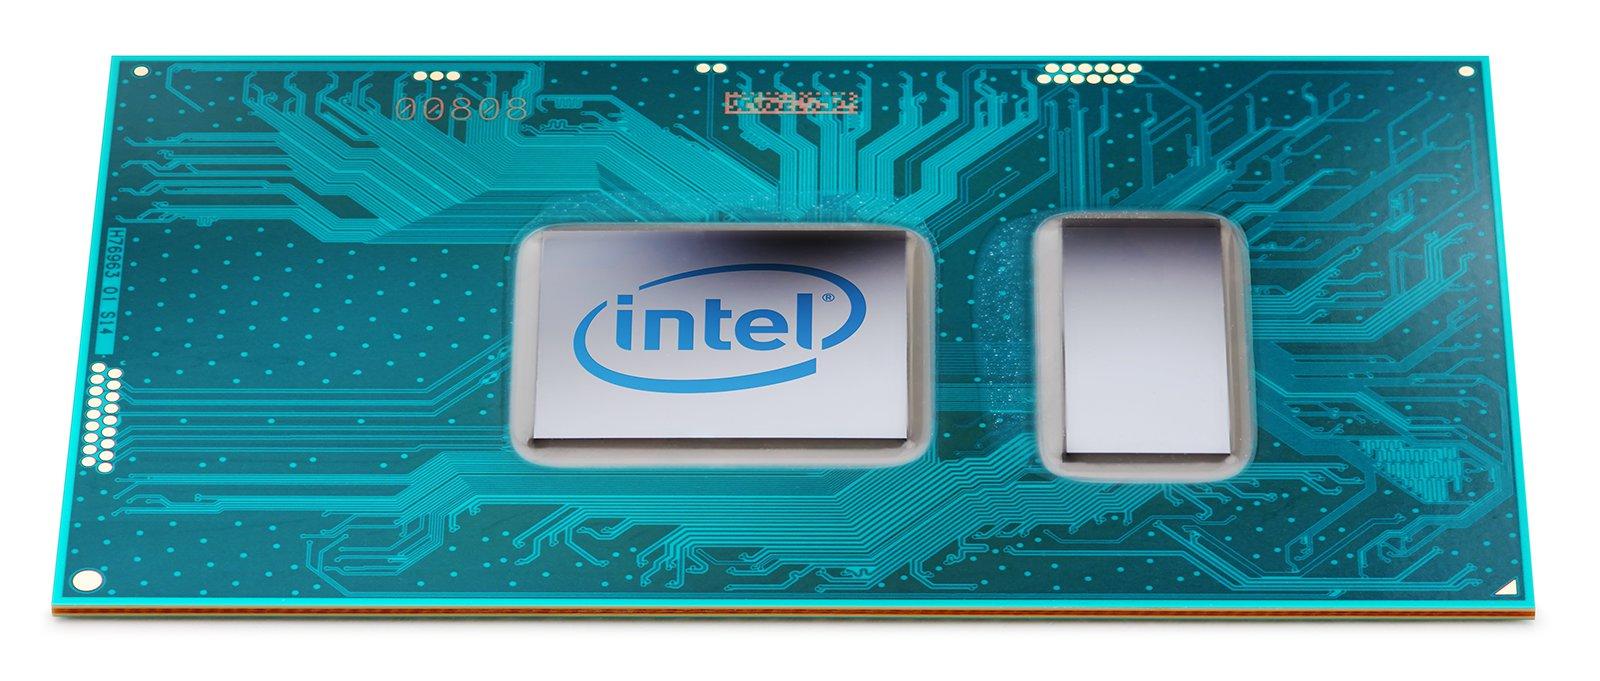 Intel's 7th generation Core